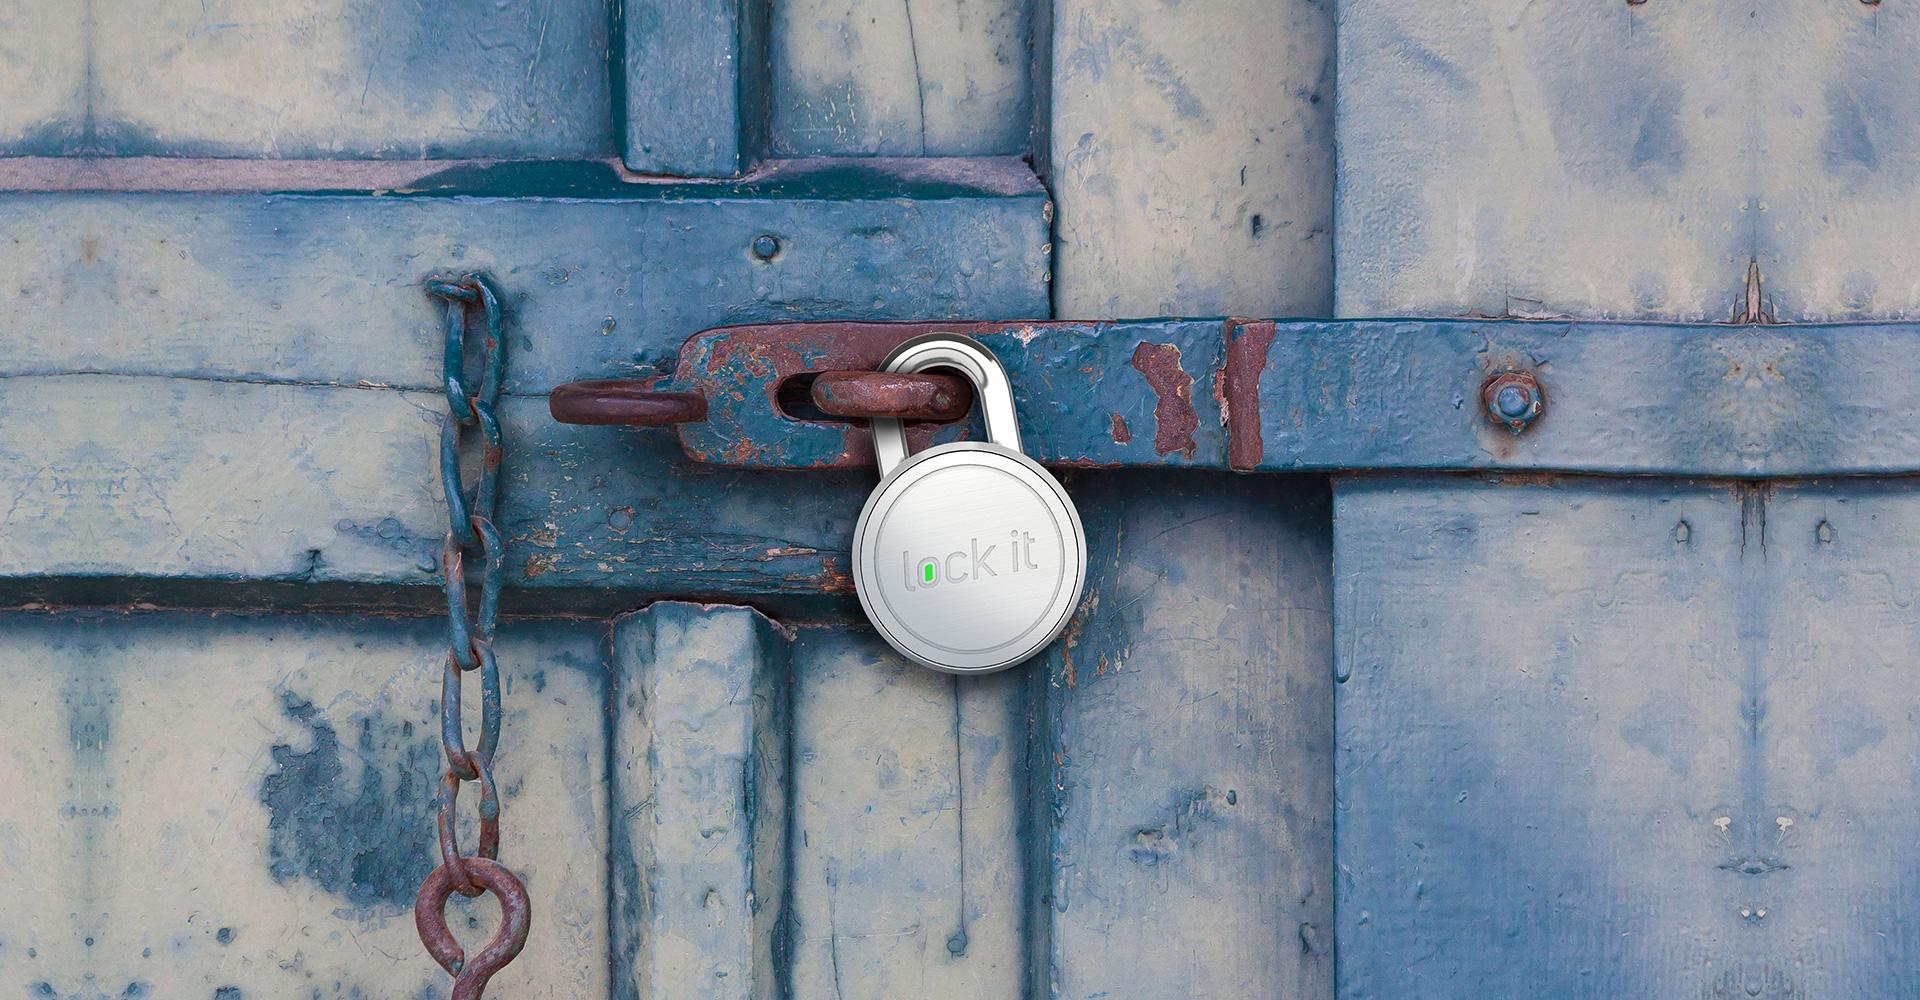 lock it image